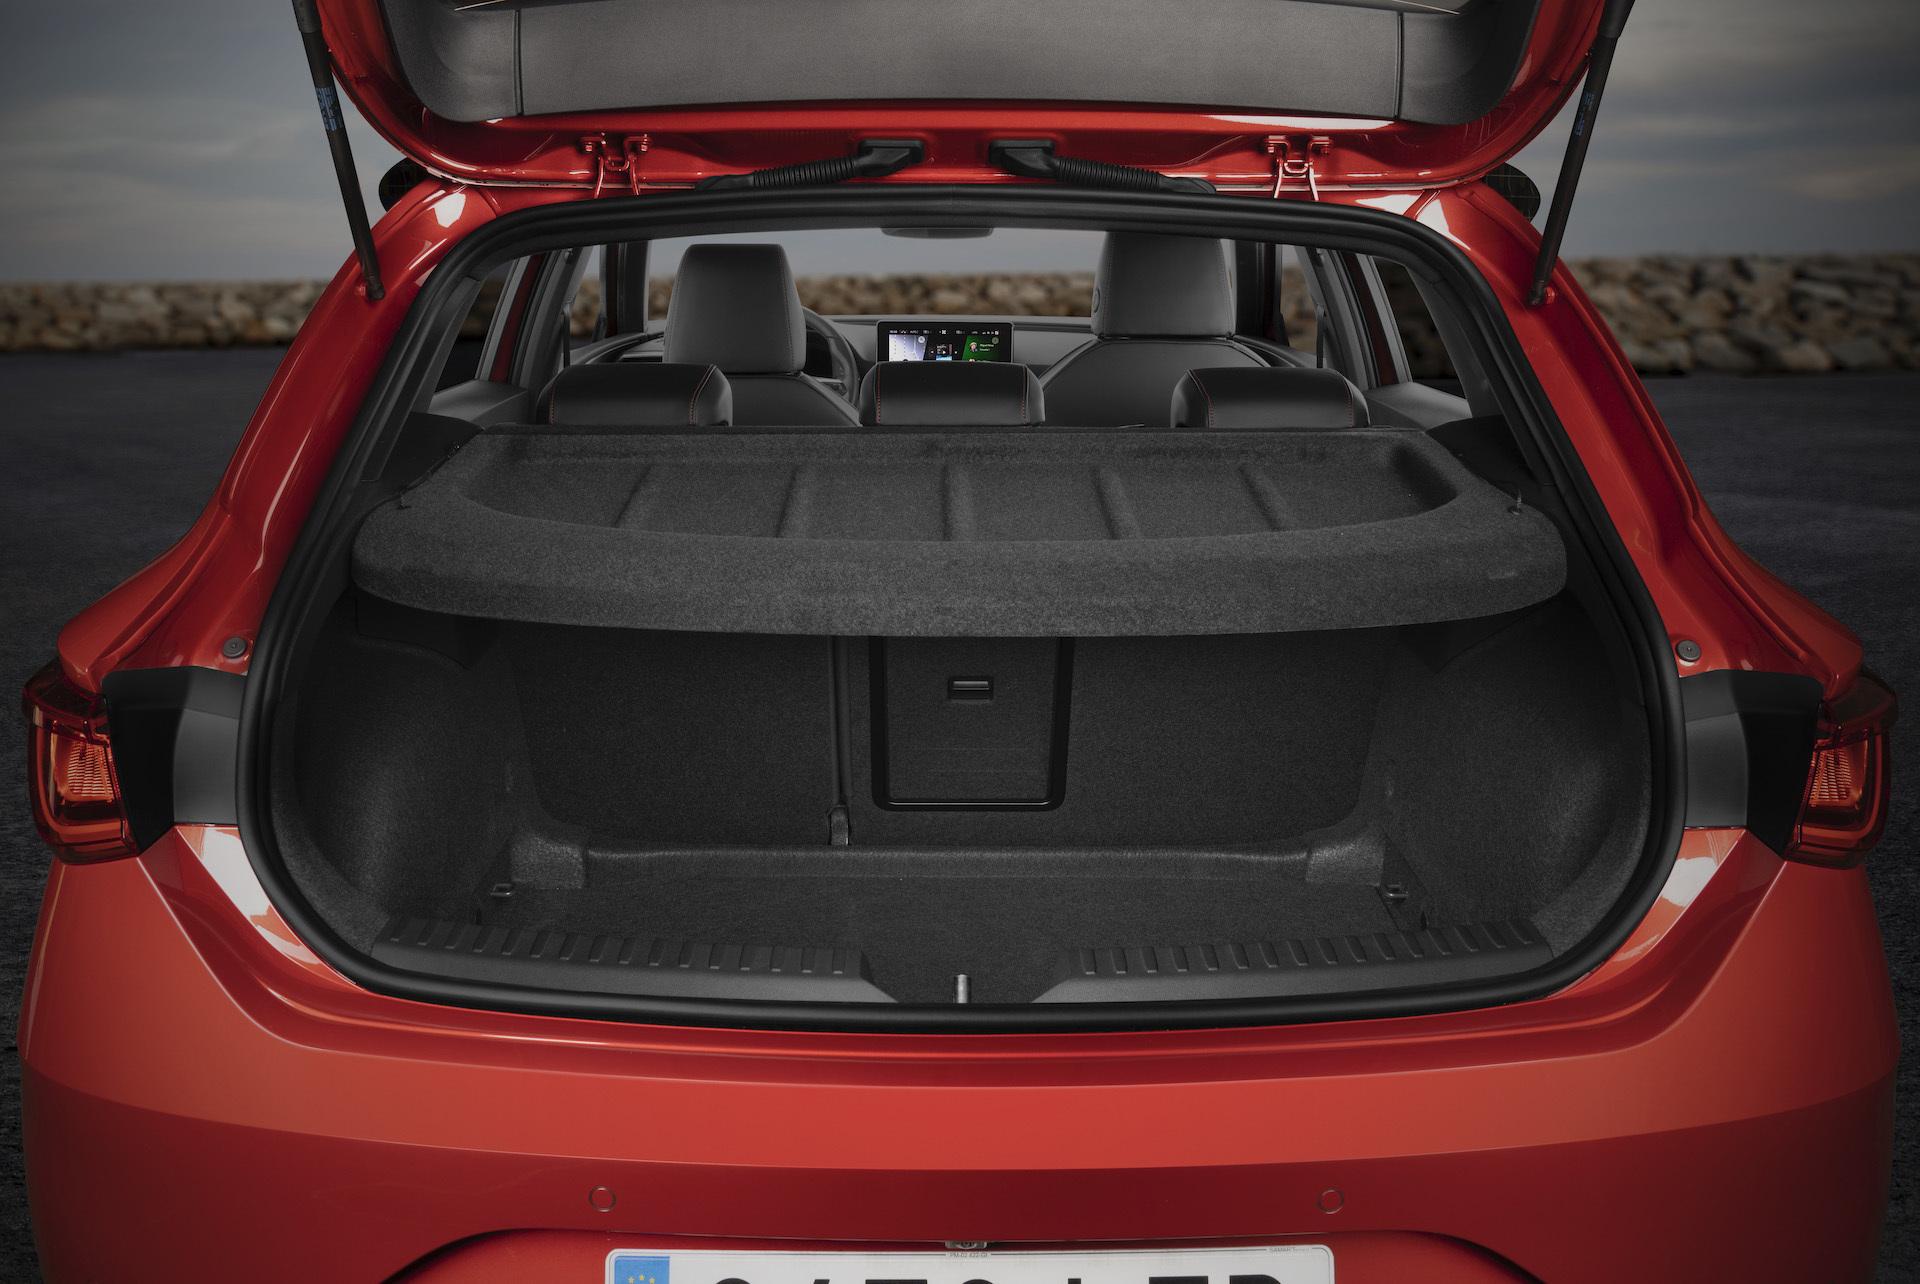 SEAT Leon mk4 (2020) 64